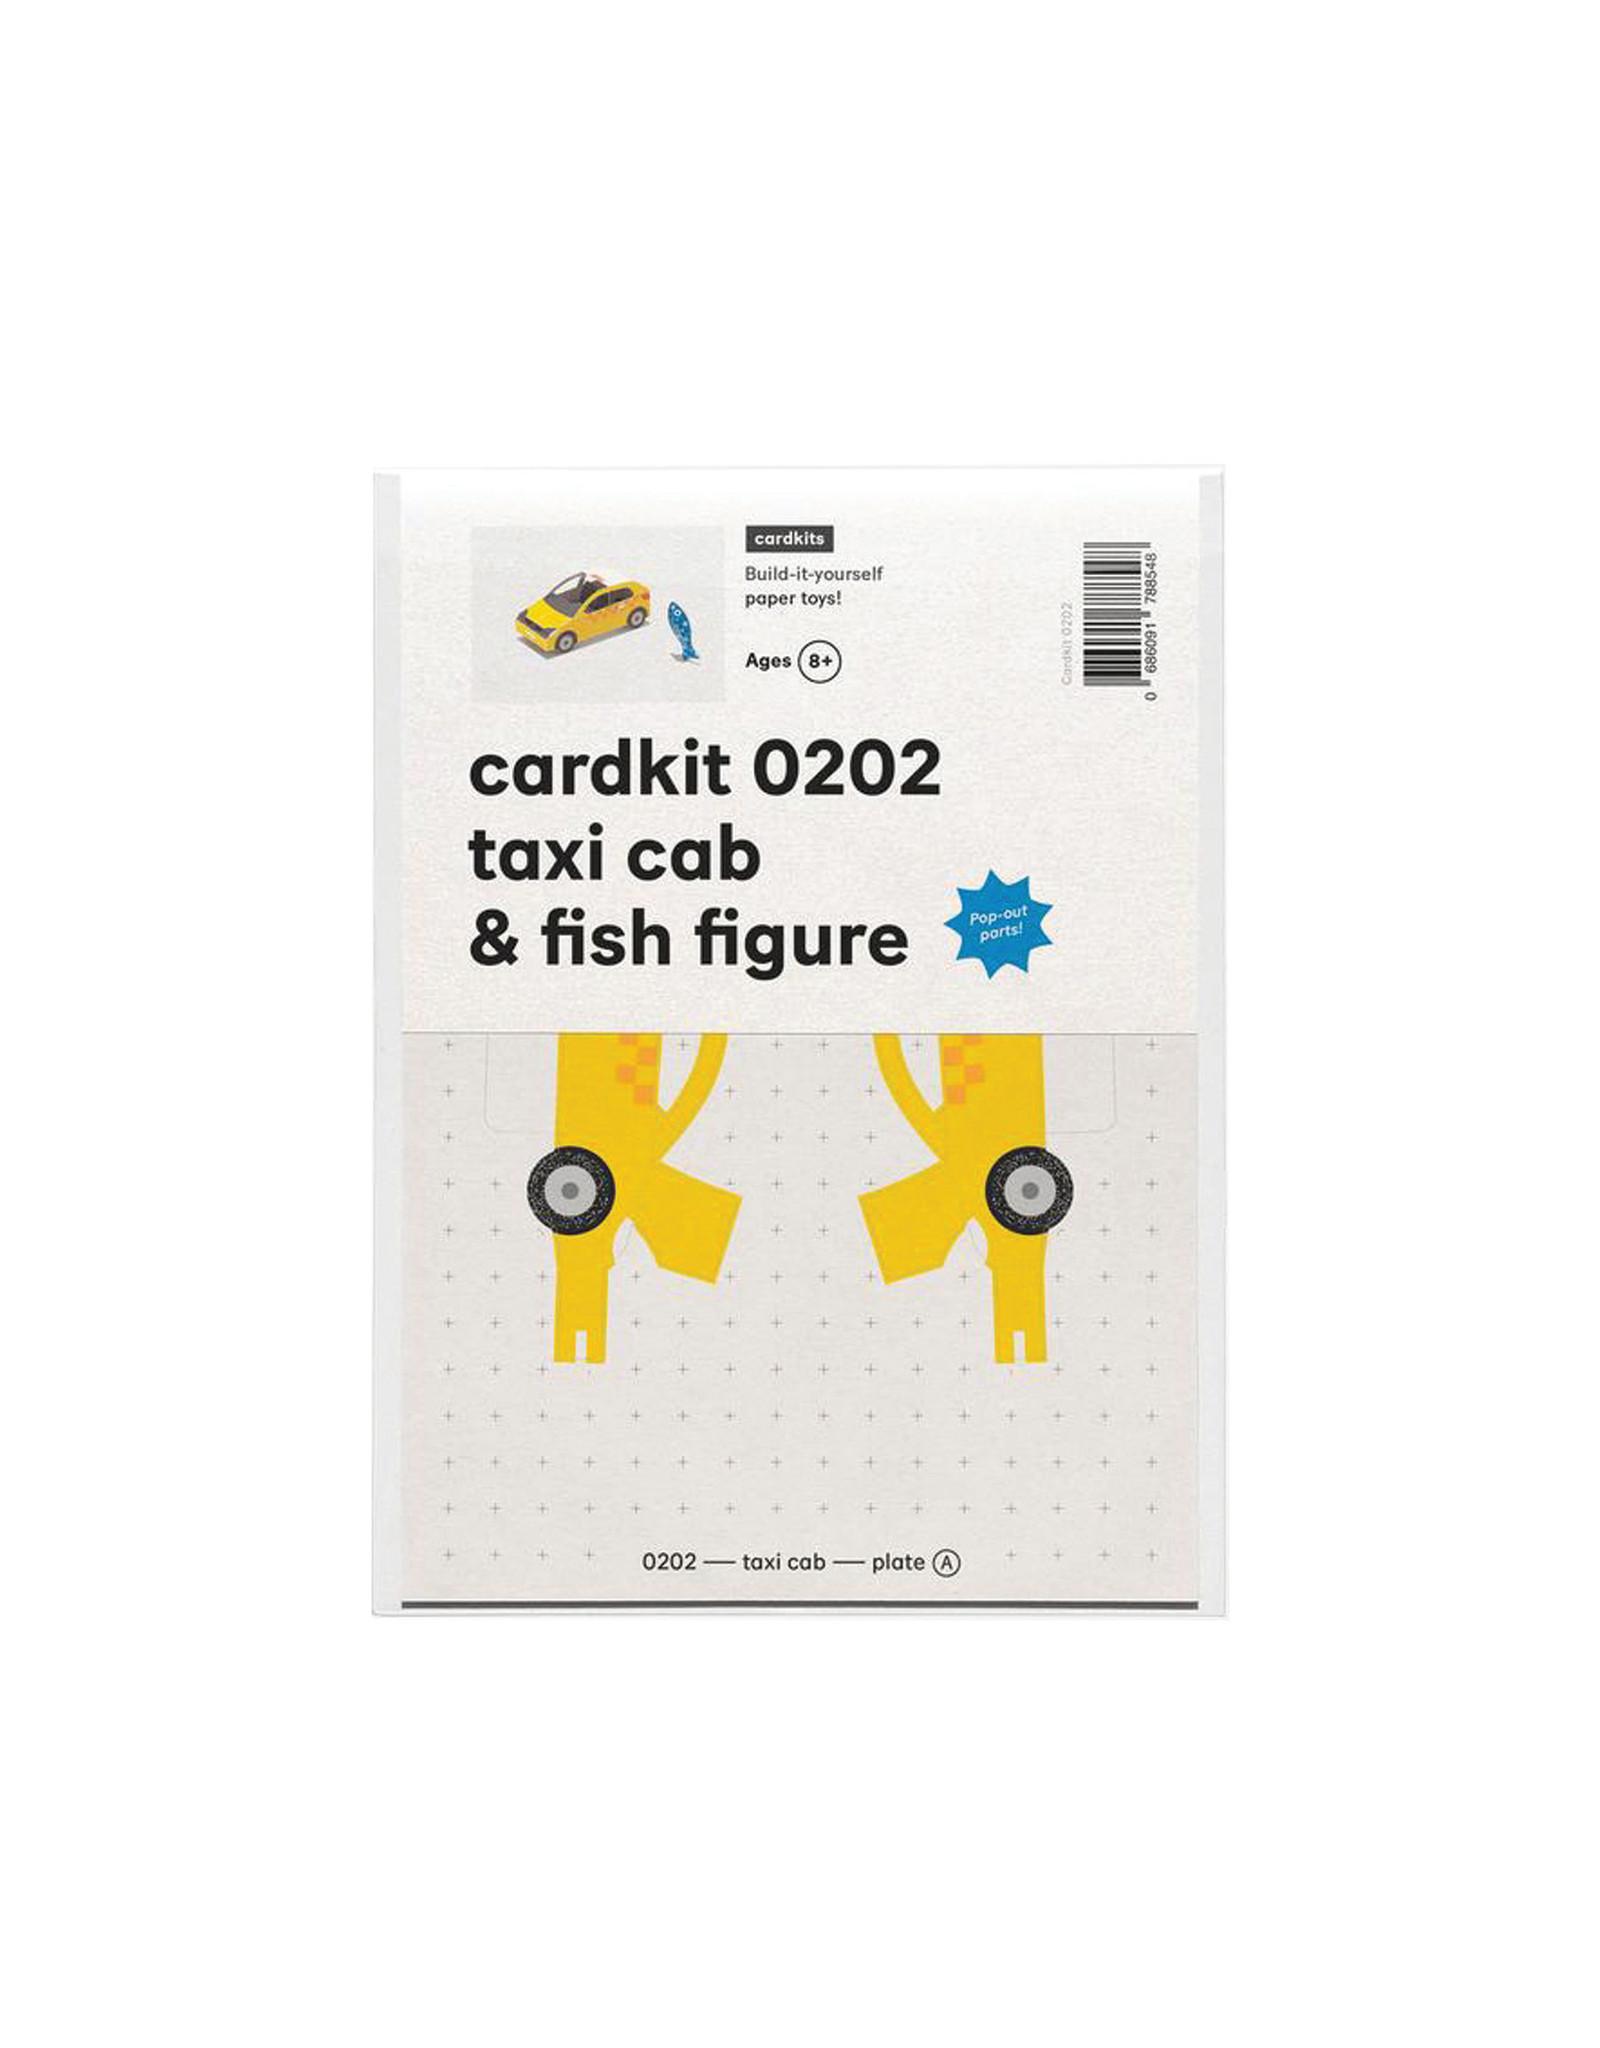 cardkit 0202: taxi cab & fish figure